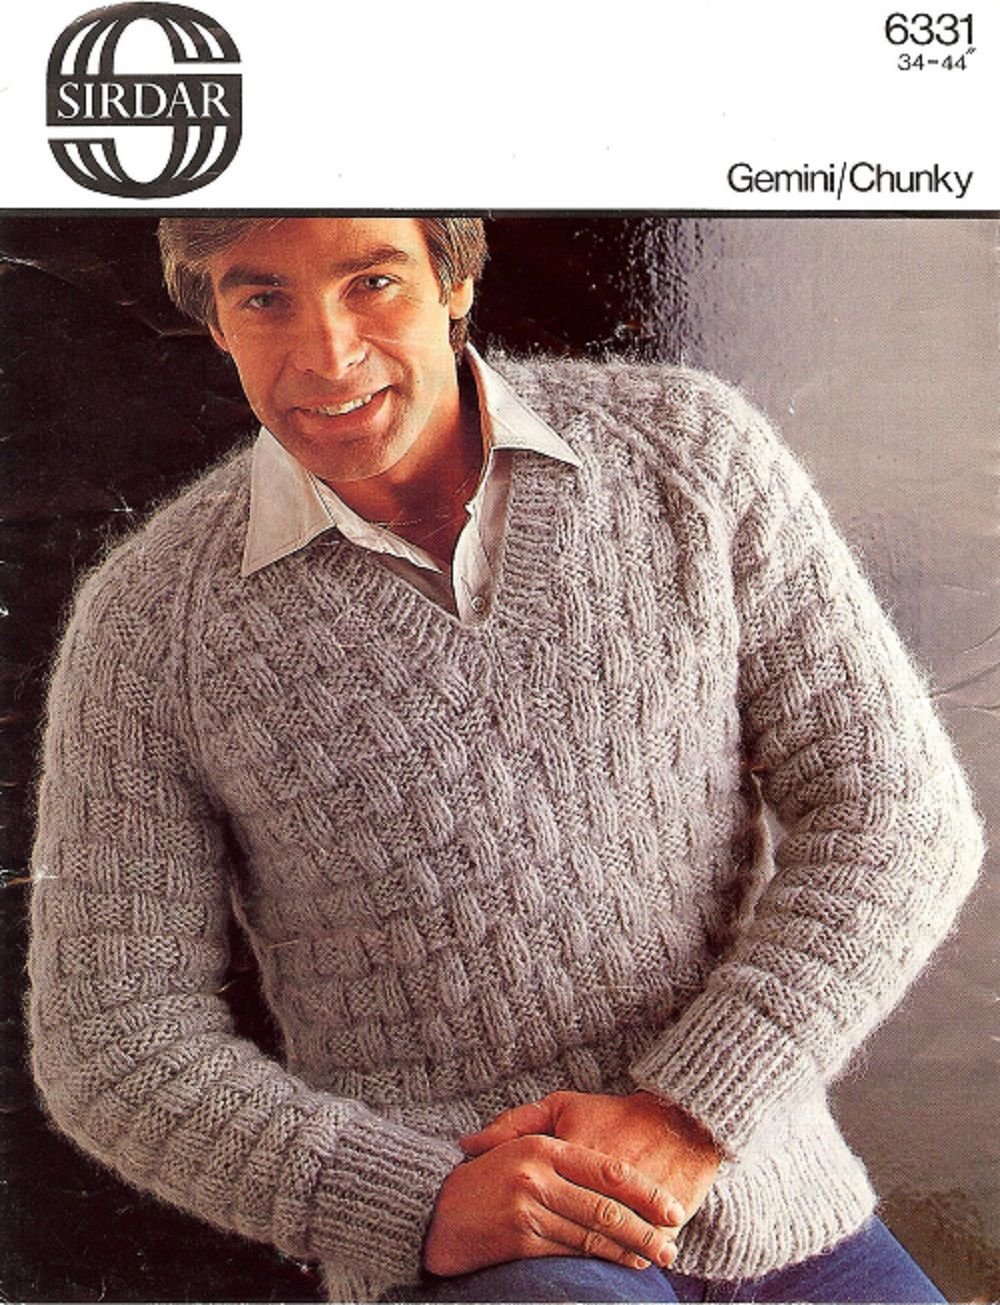 Sirdar knitting pattern 6331 chunky mans raglan v neck sweater sirdar knitting pattern 6331 chunky mans raglan v neck sweater bankloansurffo Image collections